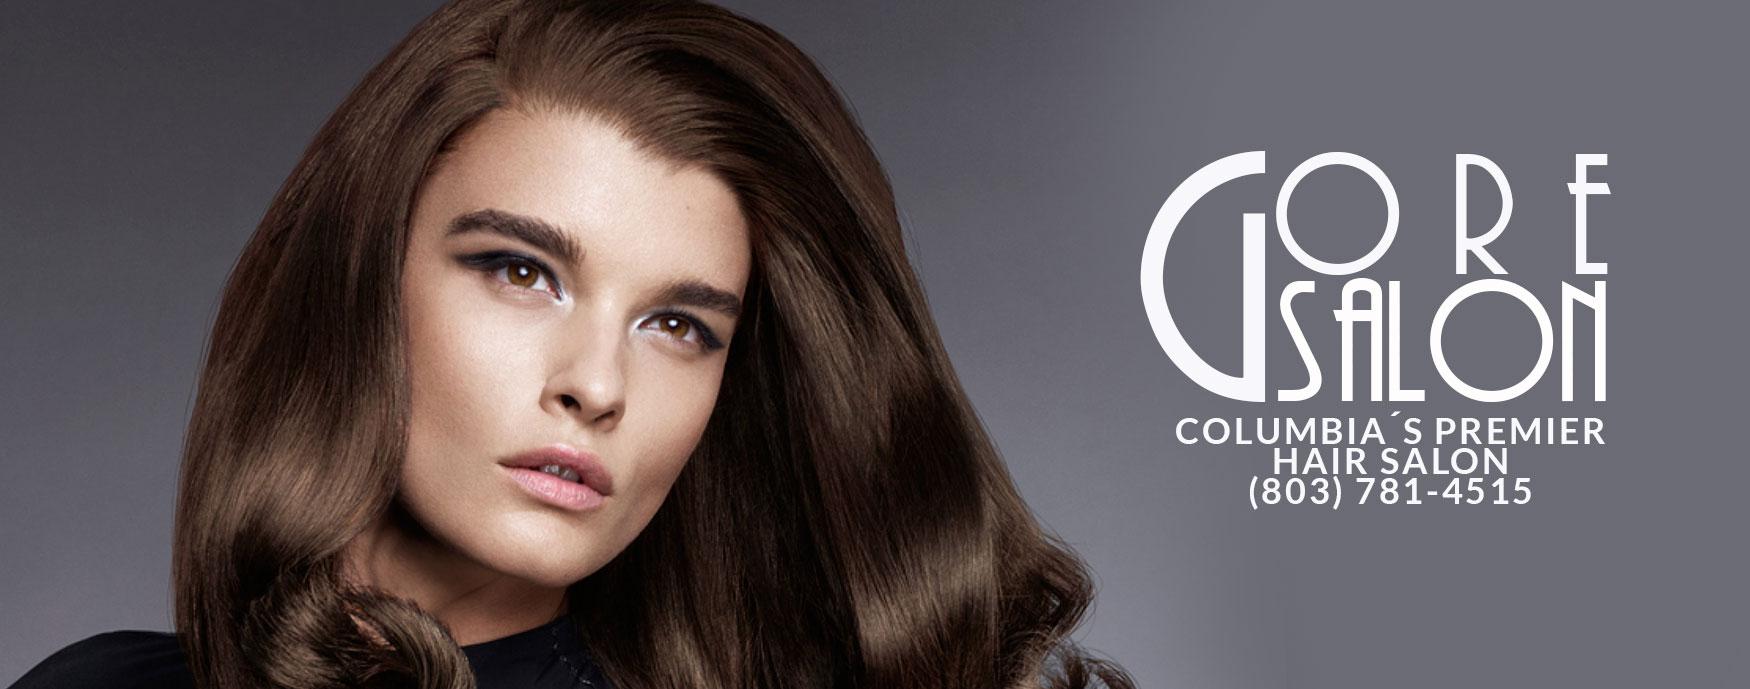 Permalink to Natural Hair Salon Columbia Sc